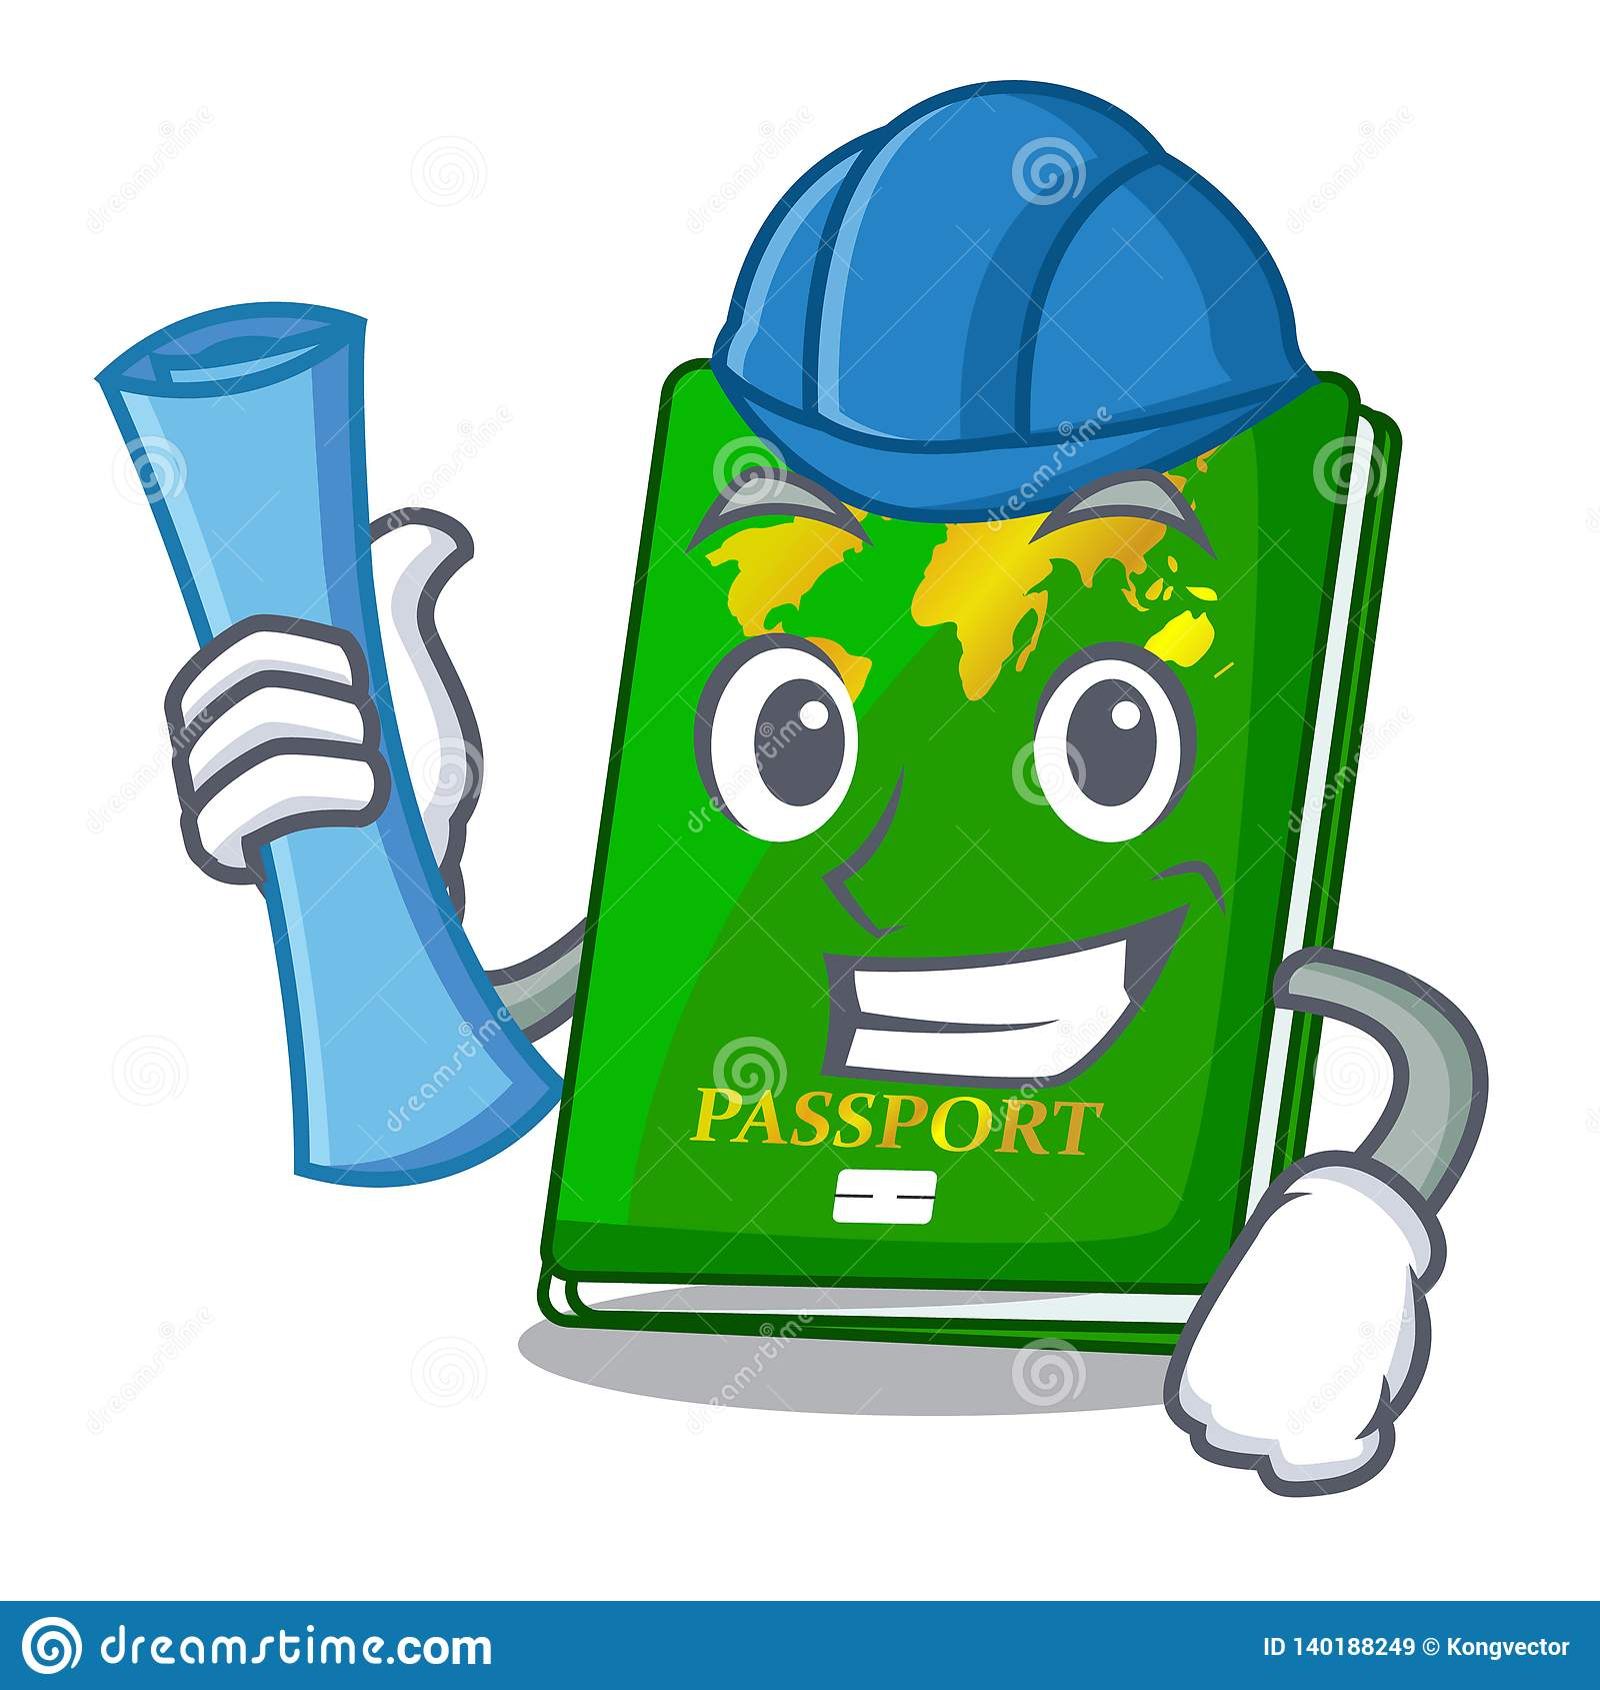 Architect green passport in the cartoon shape